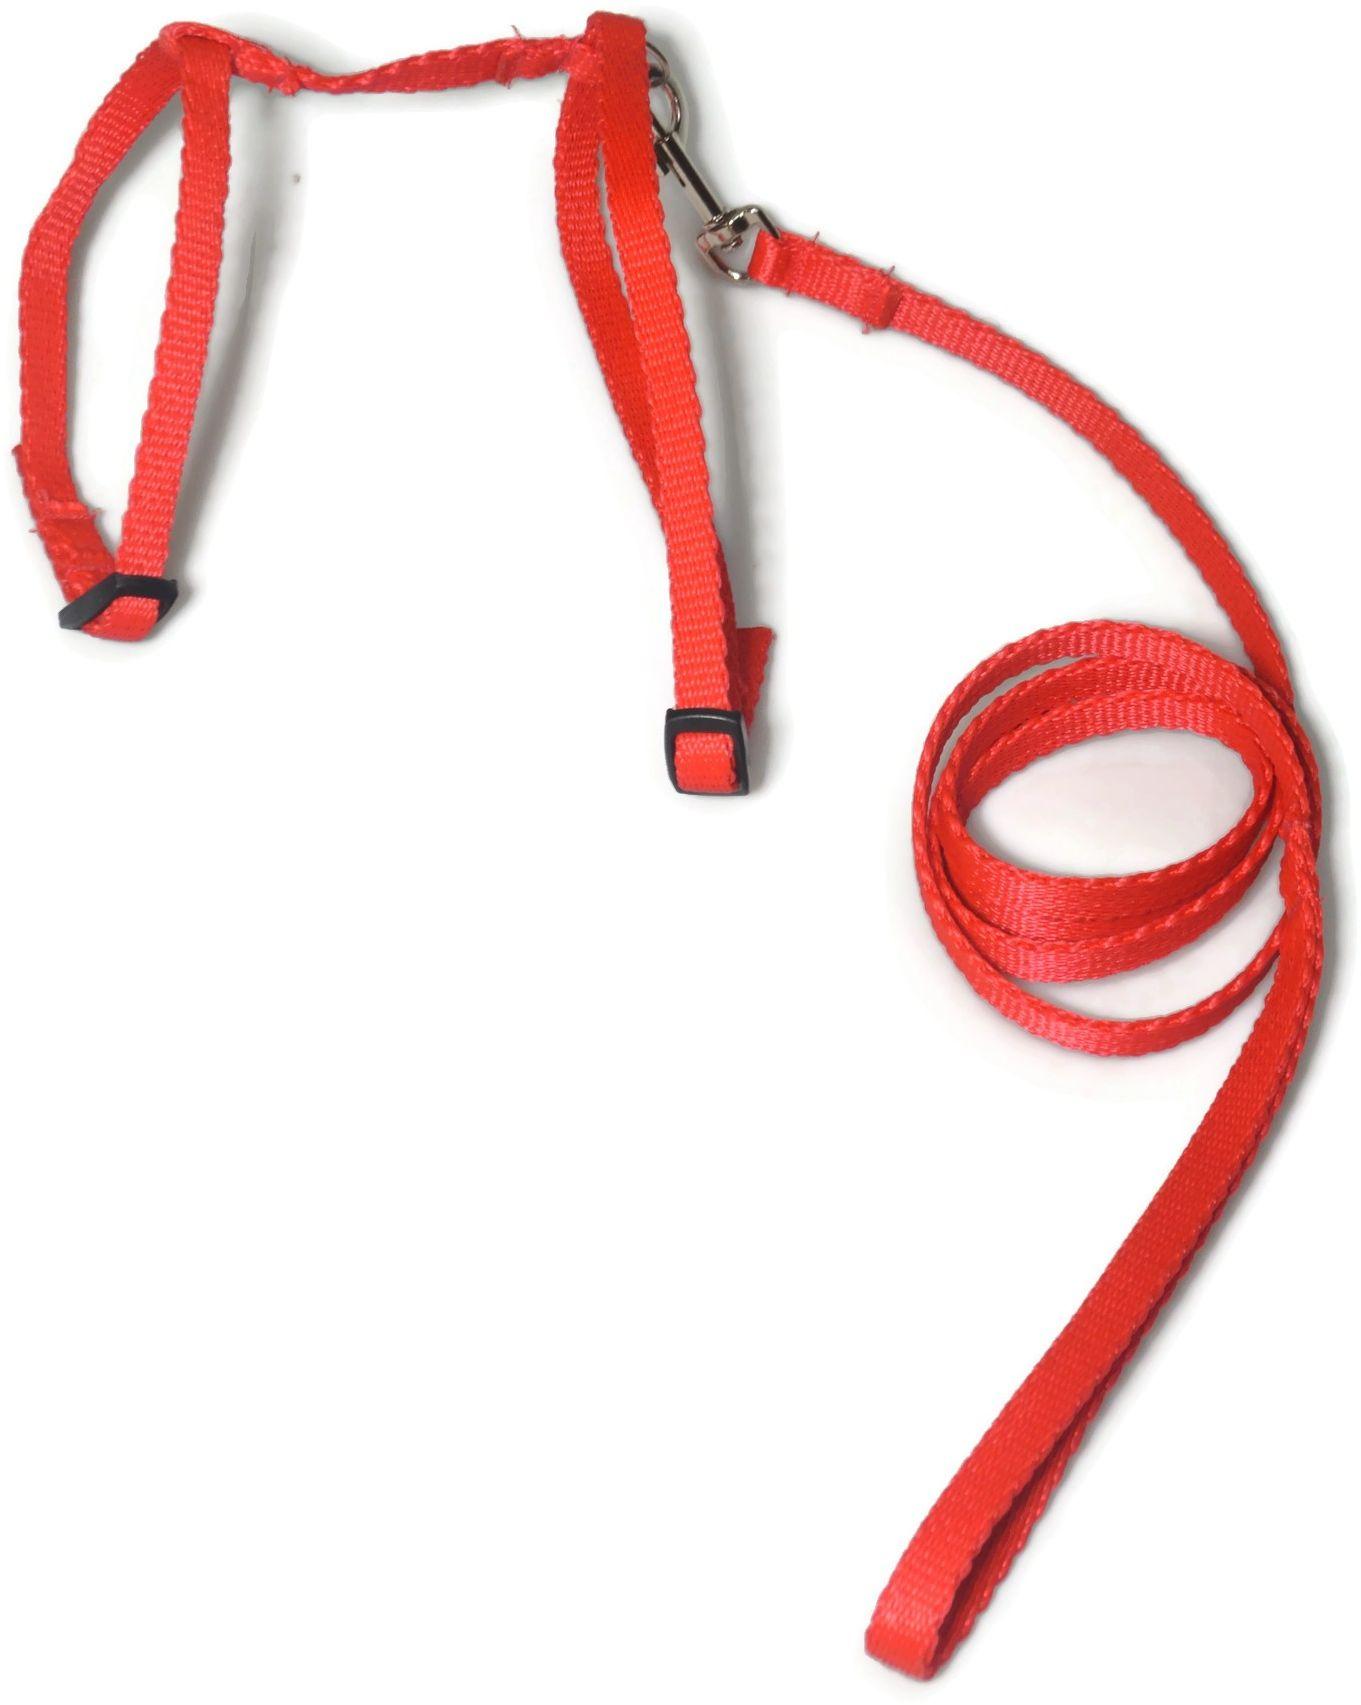 A-059 KOMPLET DLA KOTA V.2 : Kolor - Czerwony - ALIZOO